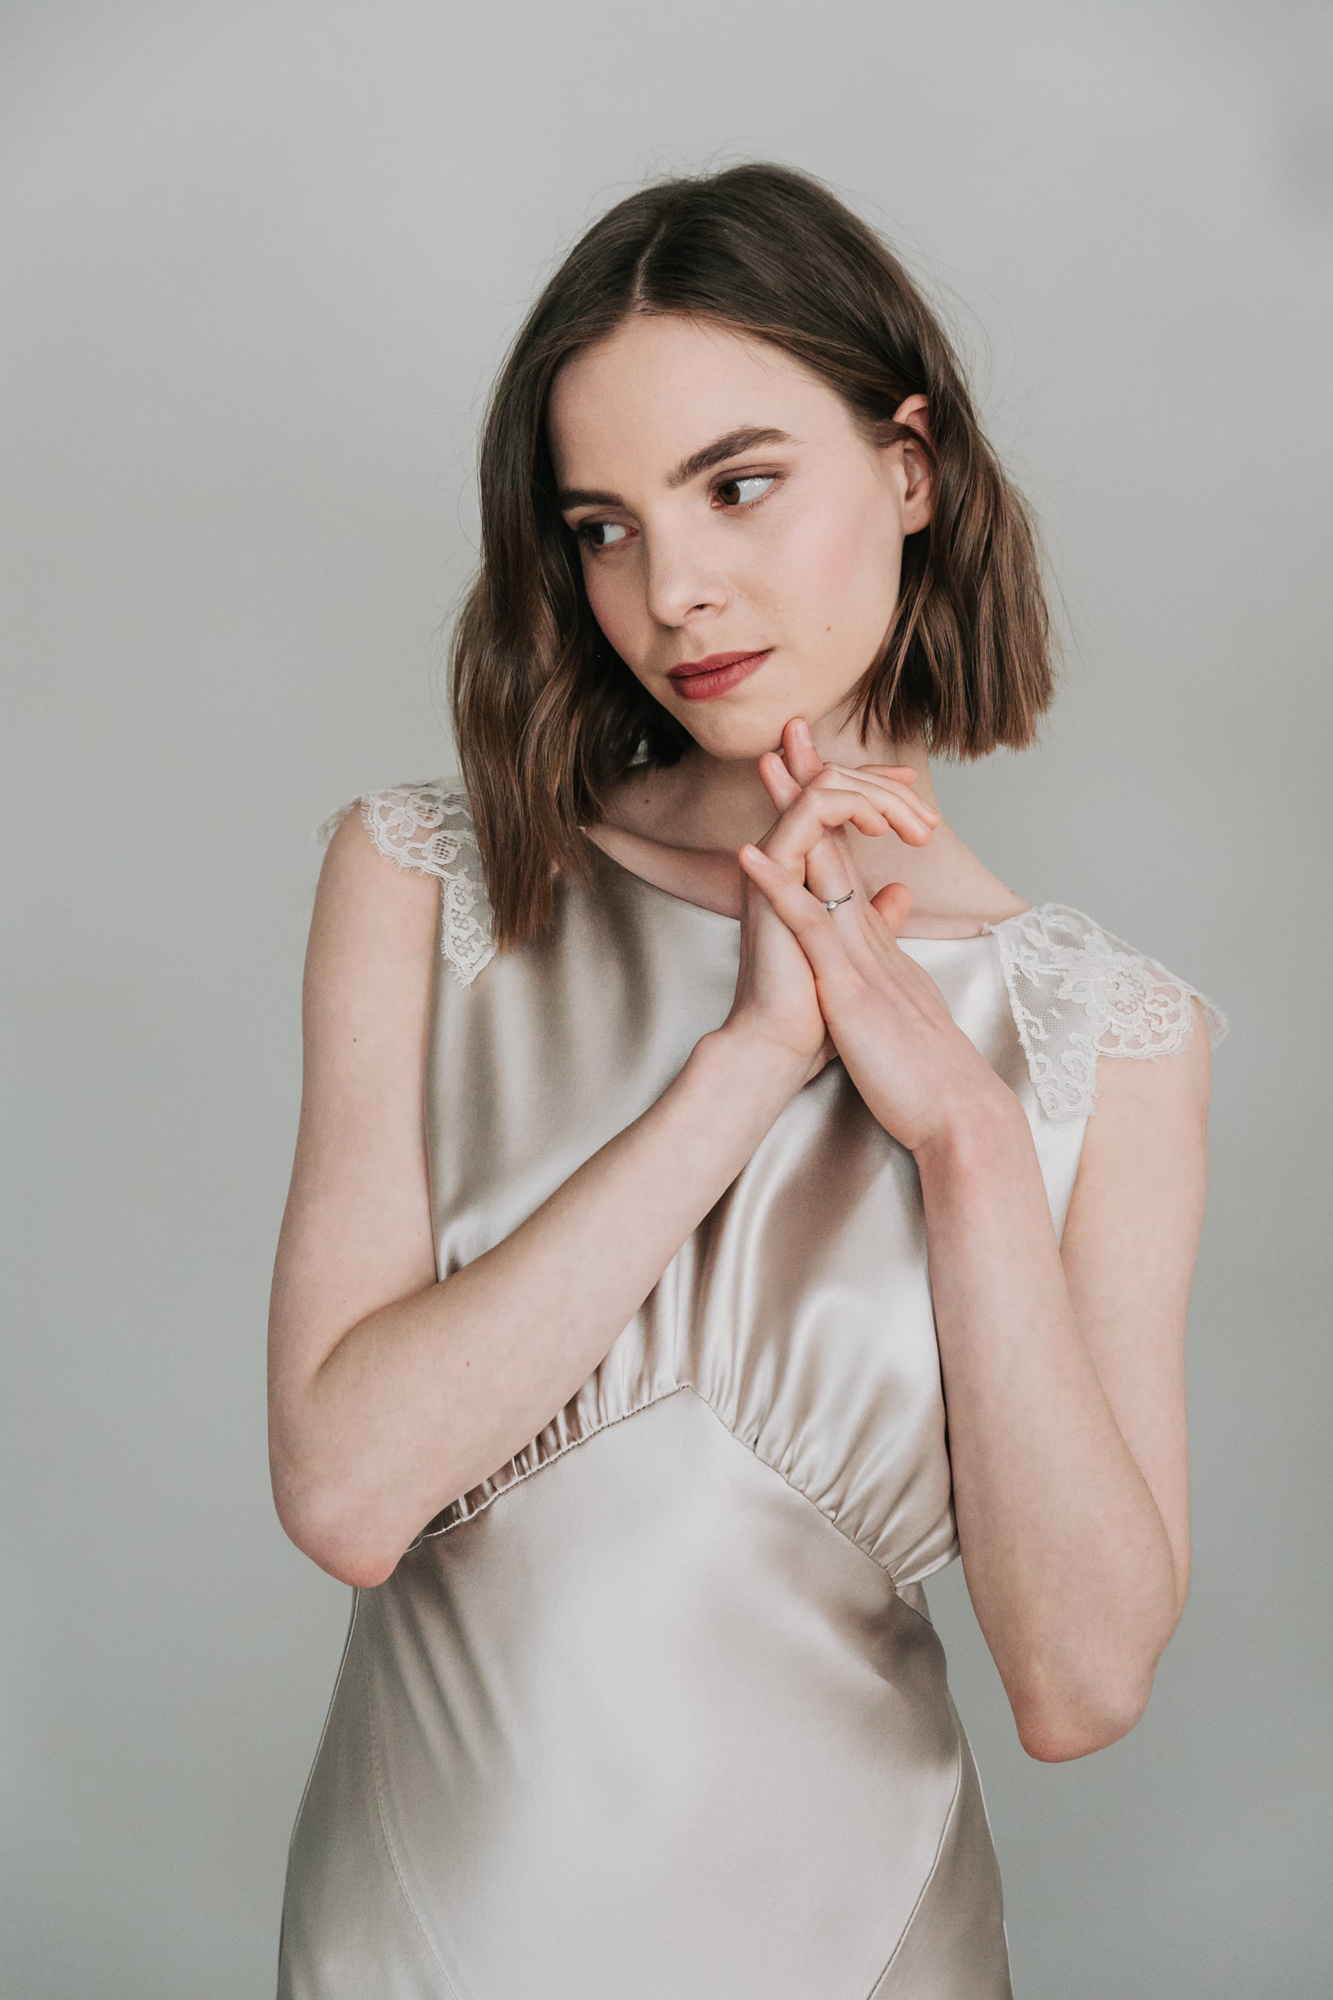 Kate-Beaumont-Sheffield-Honeysuckle-Bias-Cut-Silk-Panelled-Wedding-Gown-1.jpg